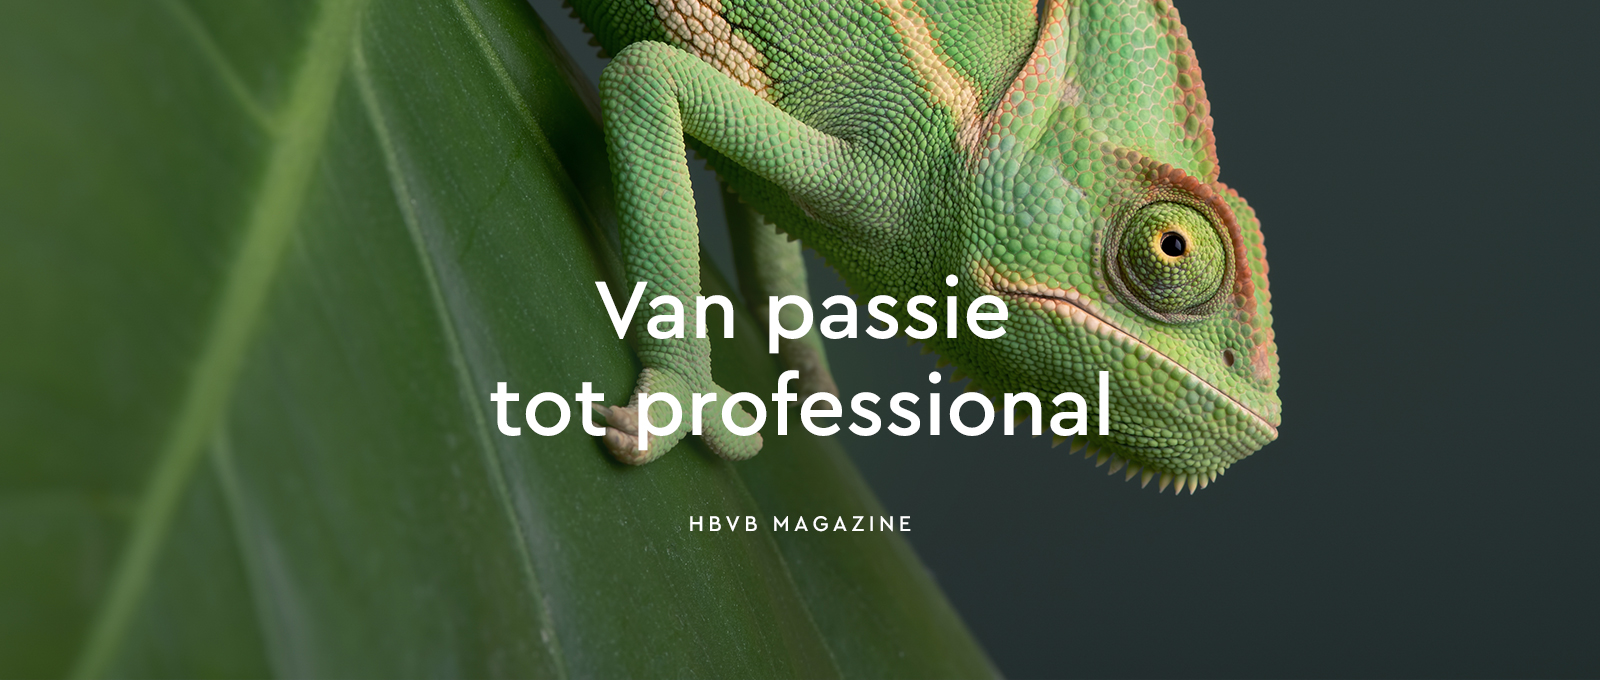 Aeres Training Centre Barneveld – Studio Mooijman en Mittelberg, Grafisch ontwerpbureau, Den Haag